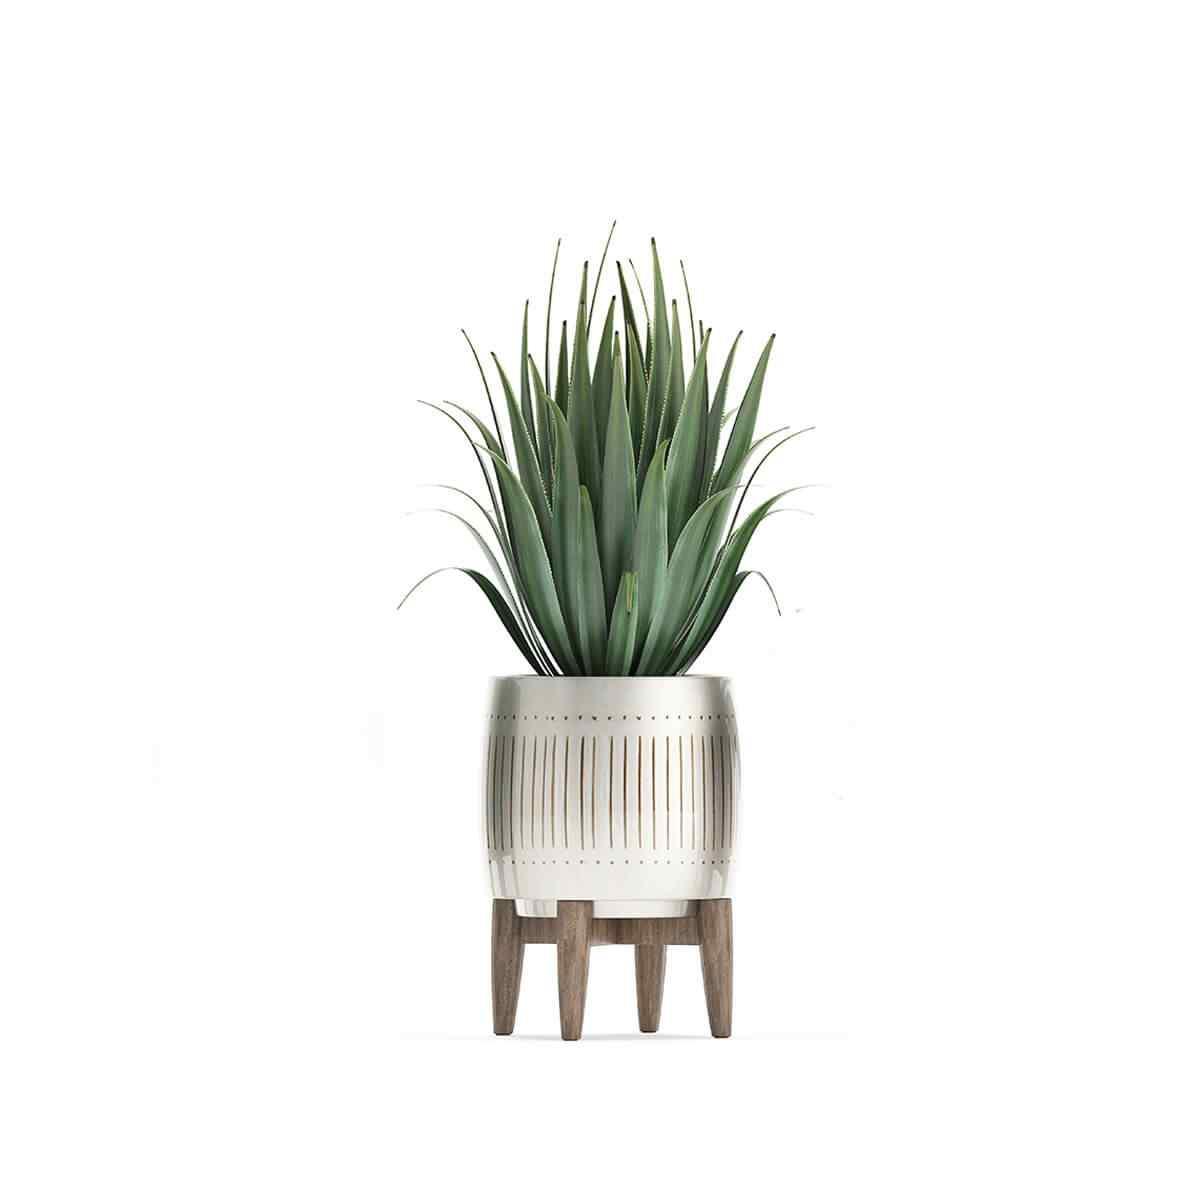 https://www.jardineriasur.cl/wp-content/uploads/2018/09/product_07.jpg